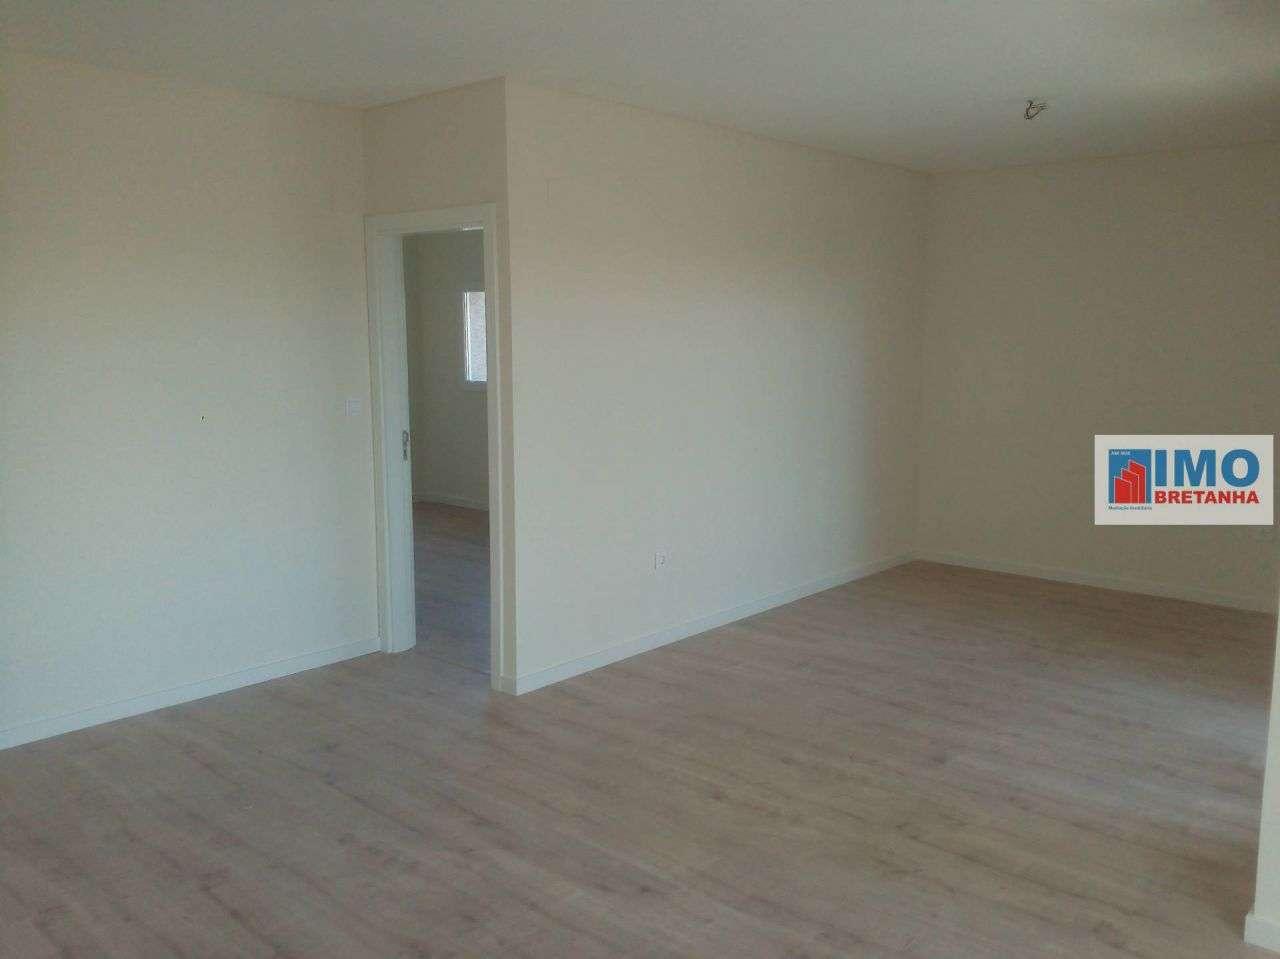 Apartamento para comprar, Covilhã e Canhoso, Covilhã, Castelo Branco - Foto 6